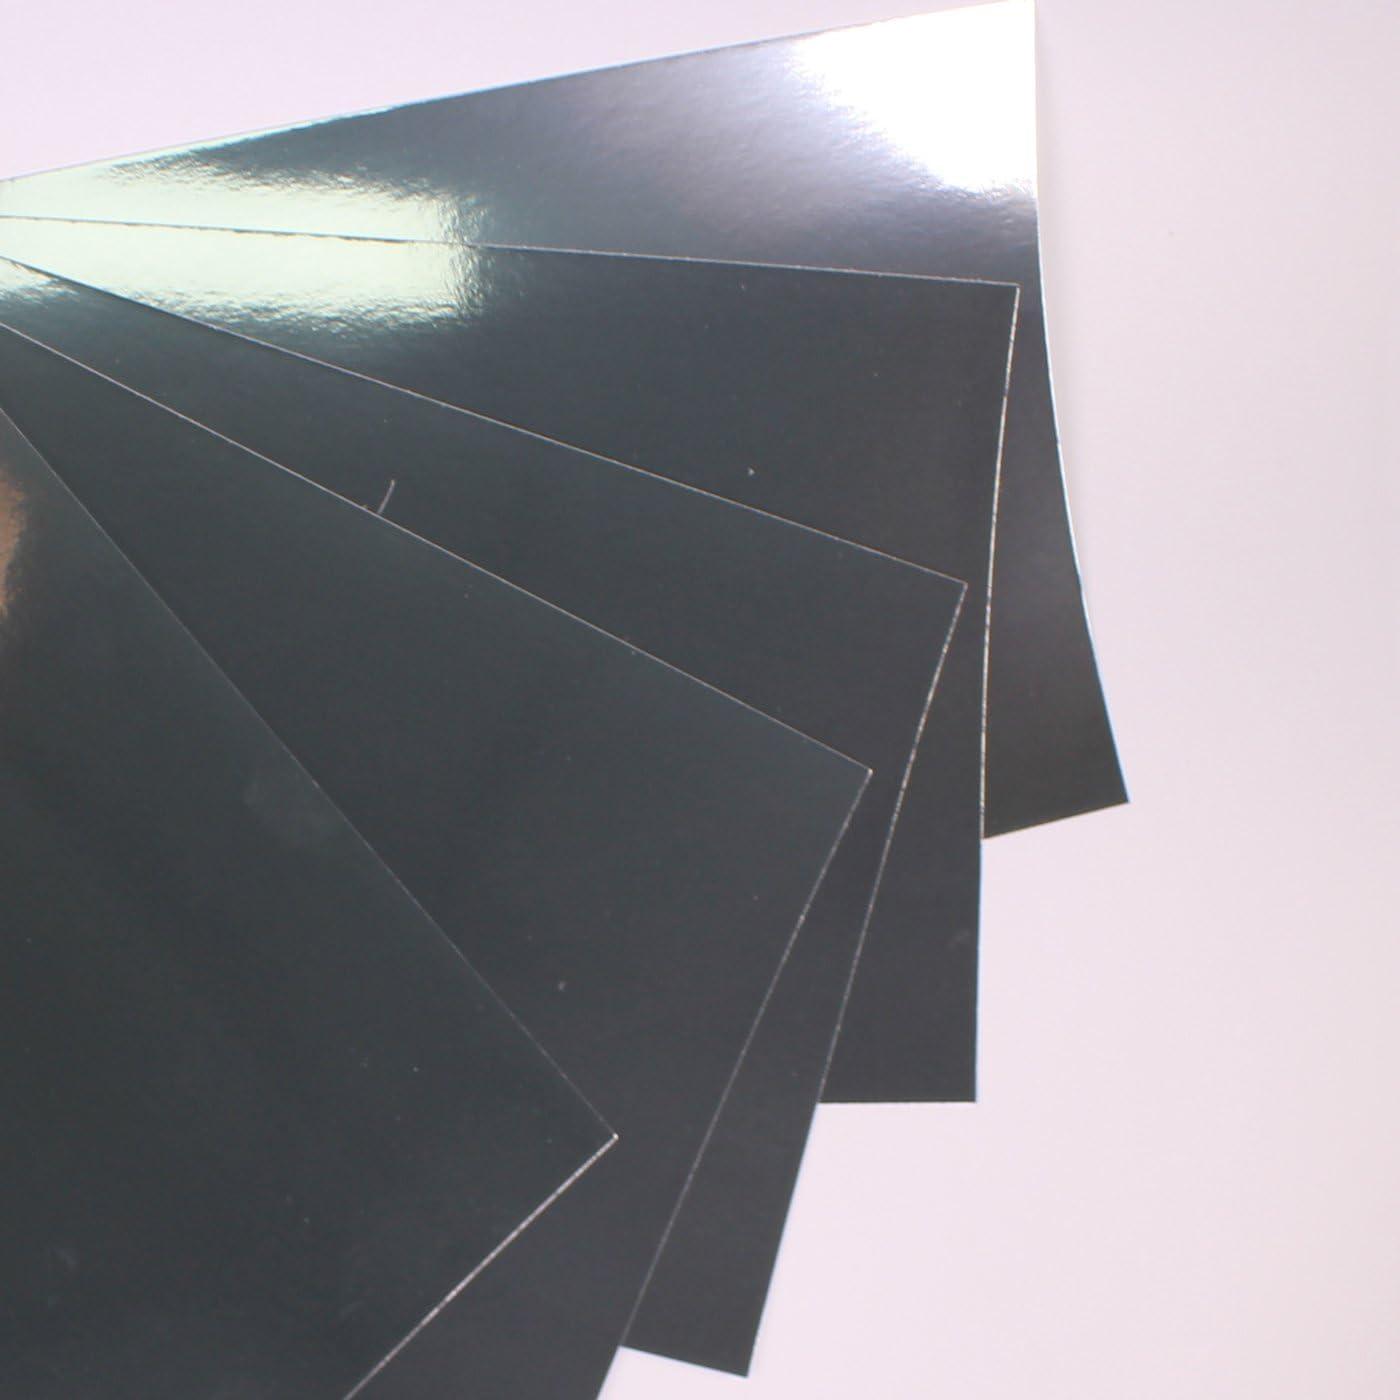 self adhesive blue and silver 5 sheets A4 metallic//mirri card